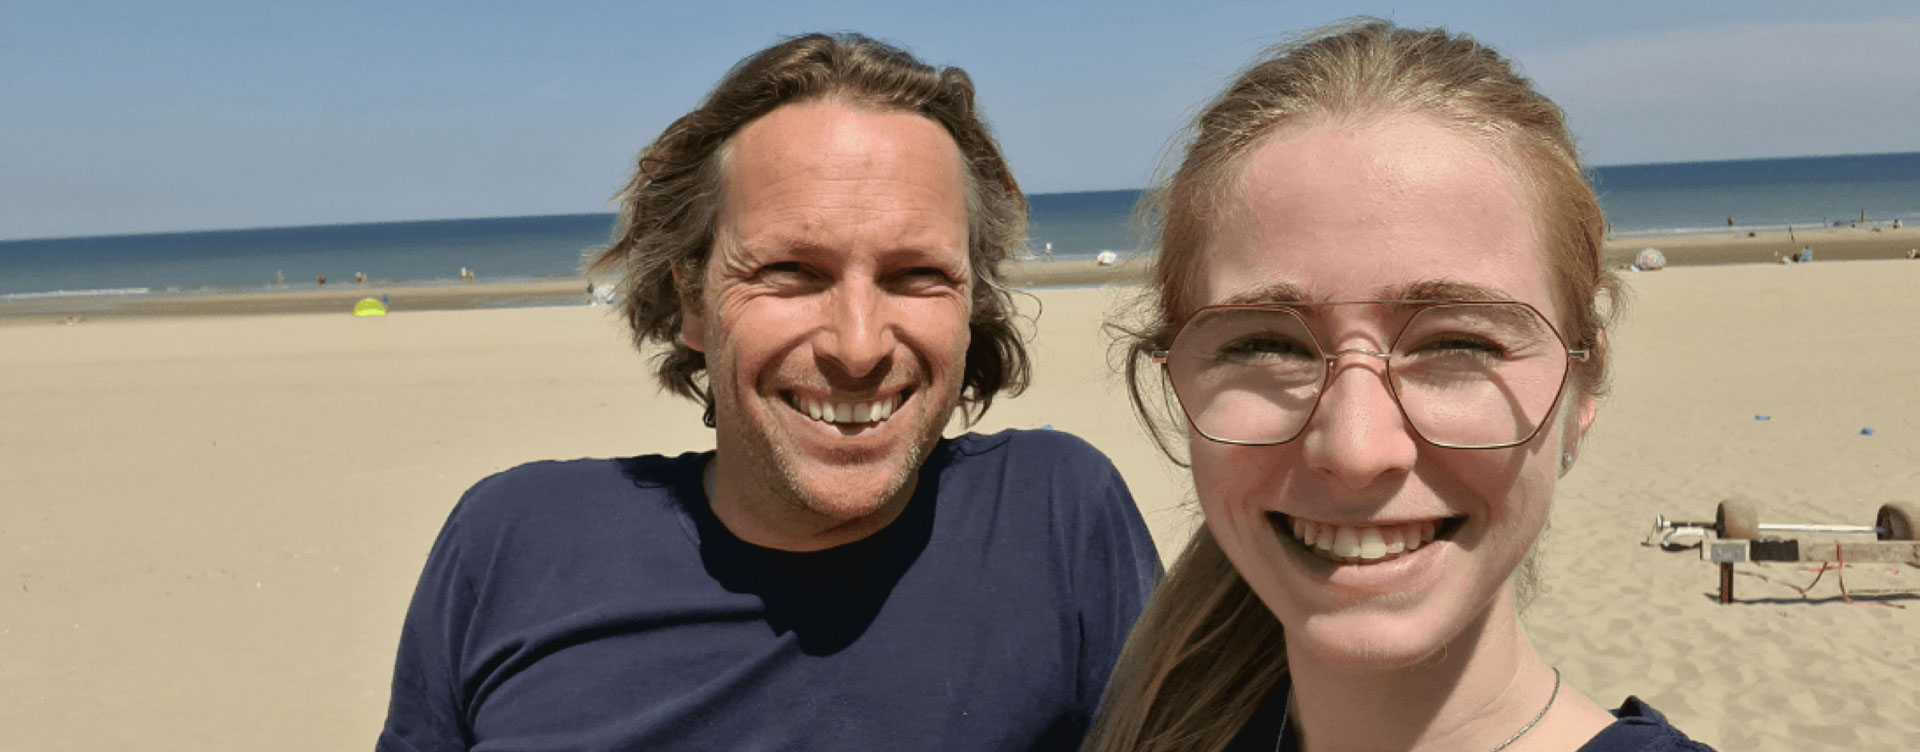 IKO Examiner and Kitesurf Instructor Stephen Zaat